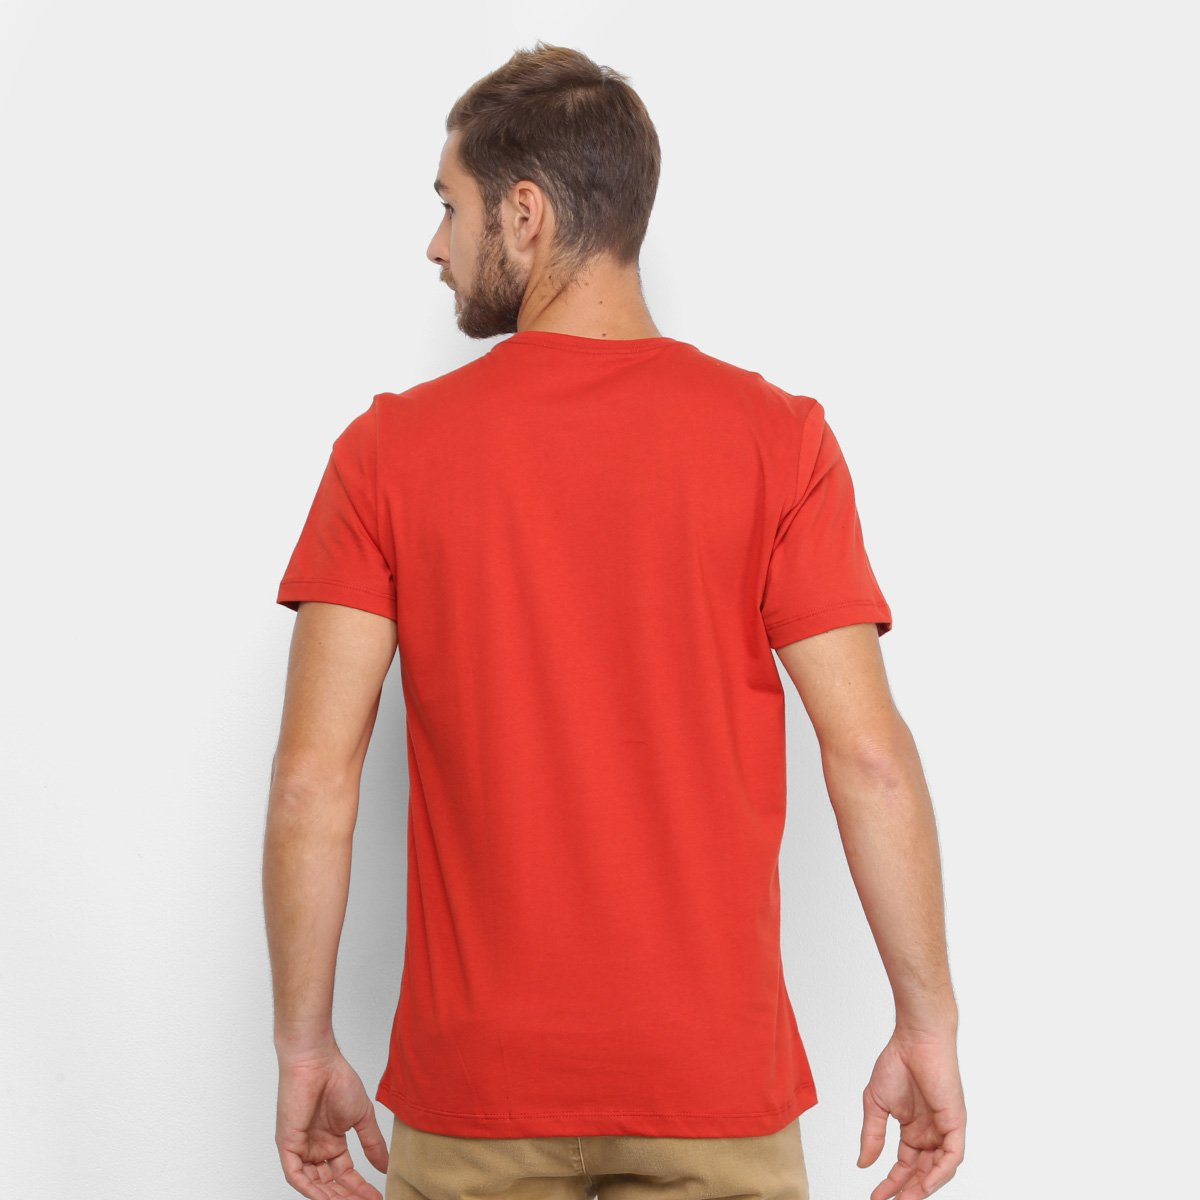 Camiseta Colcci Estampada Manga Curta Masculina - Vermelho